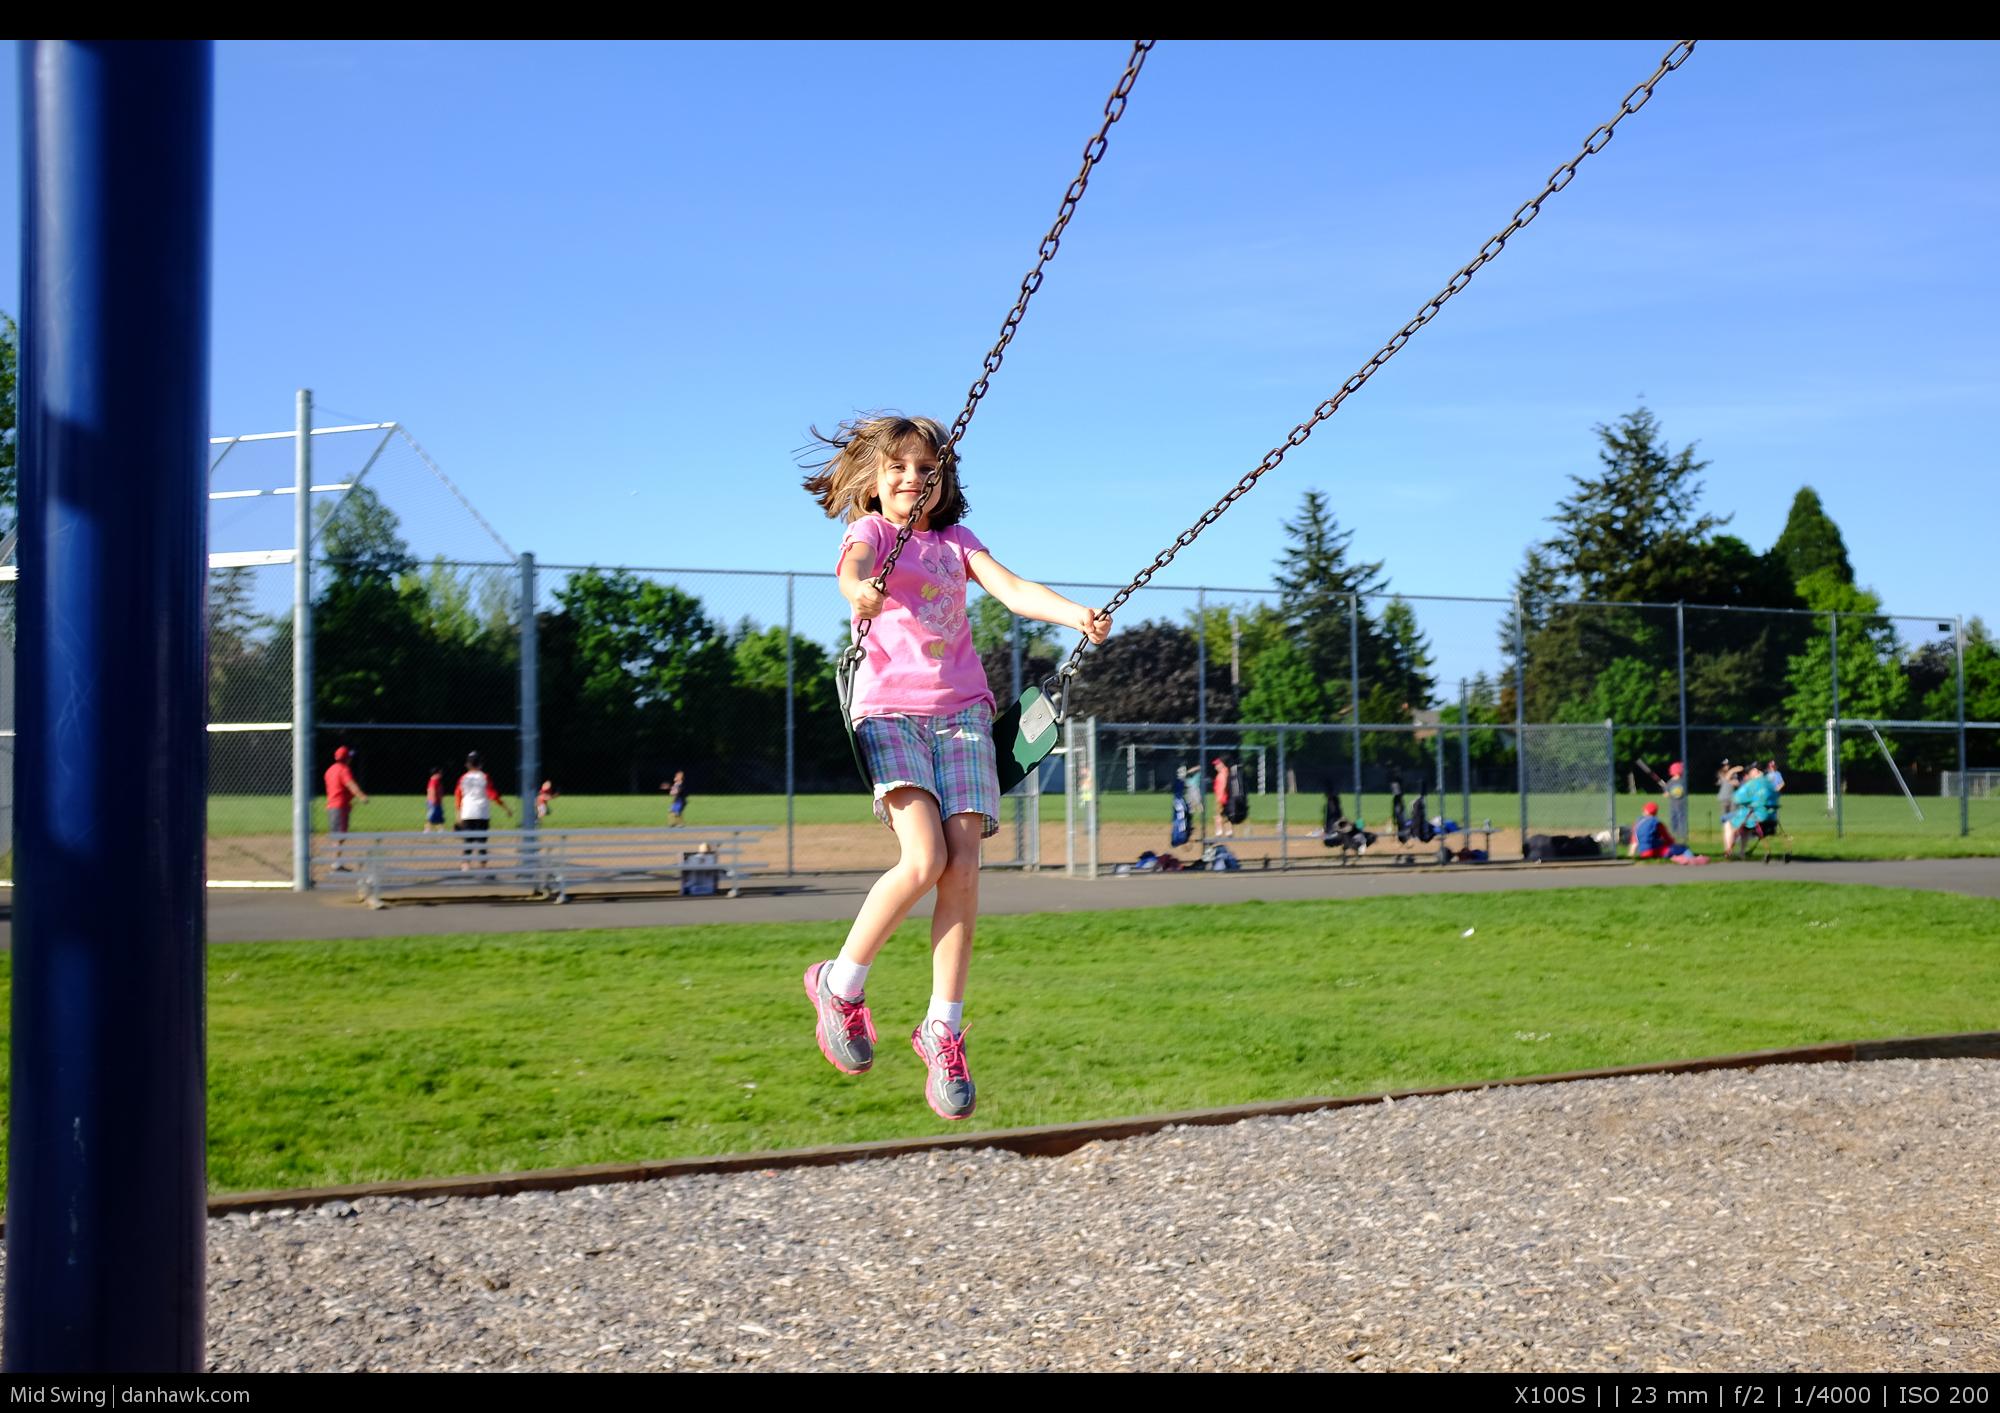 Mid Swing